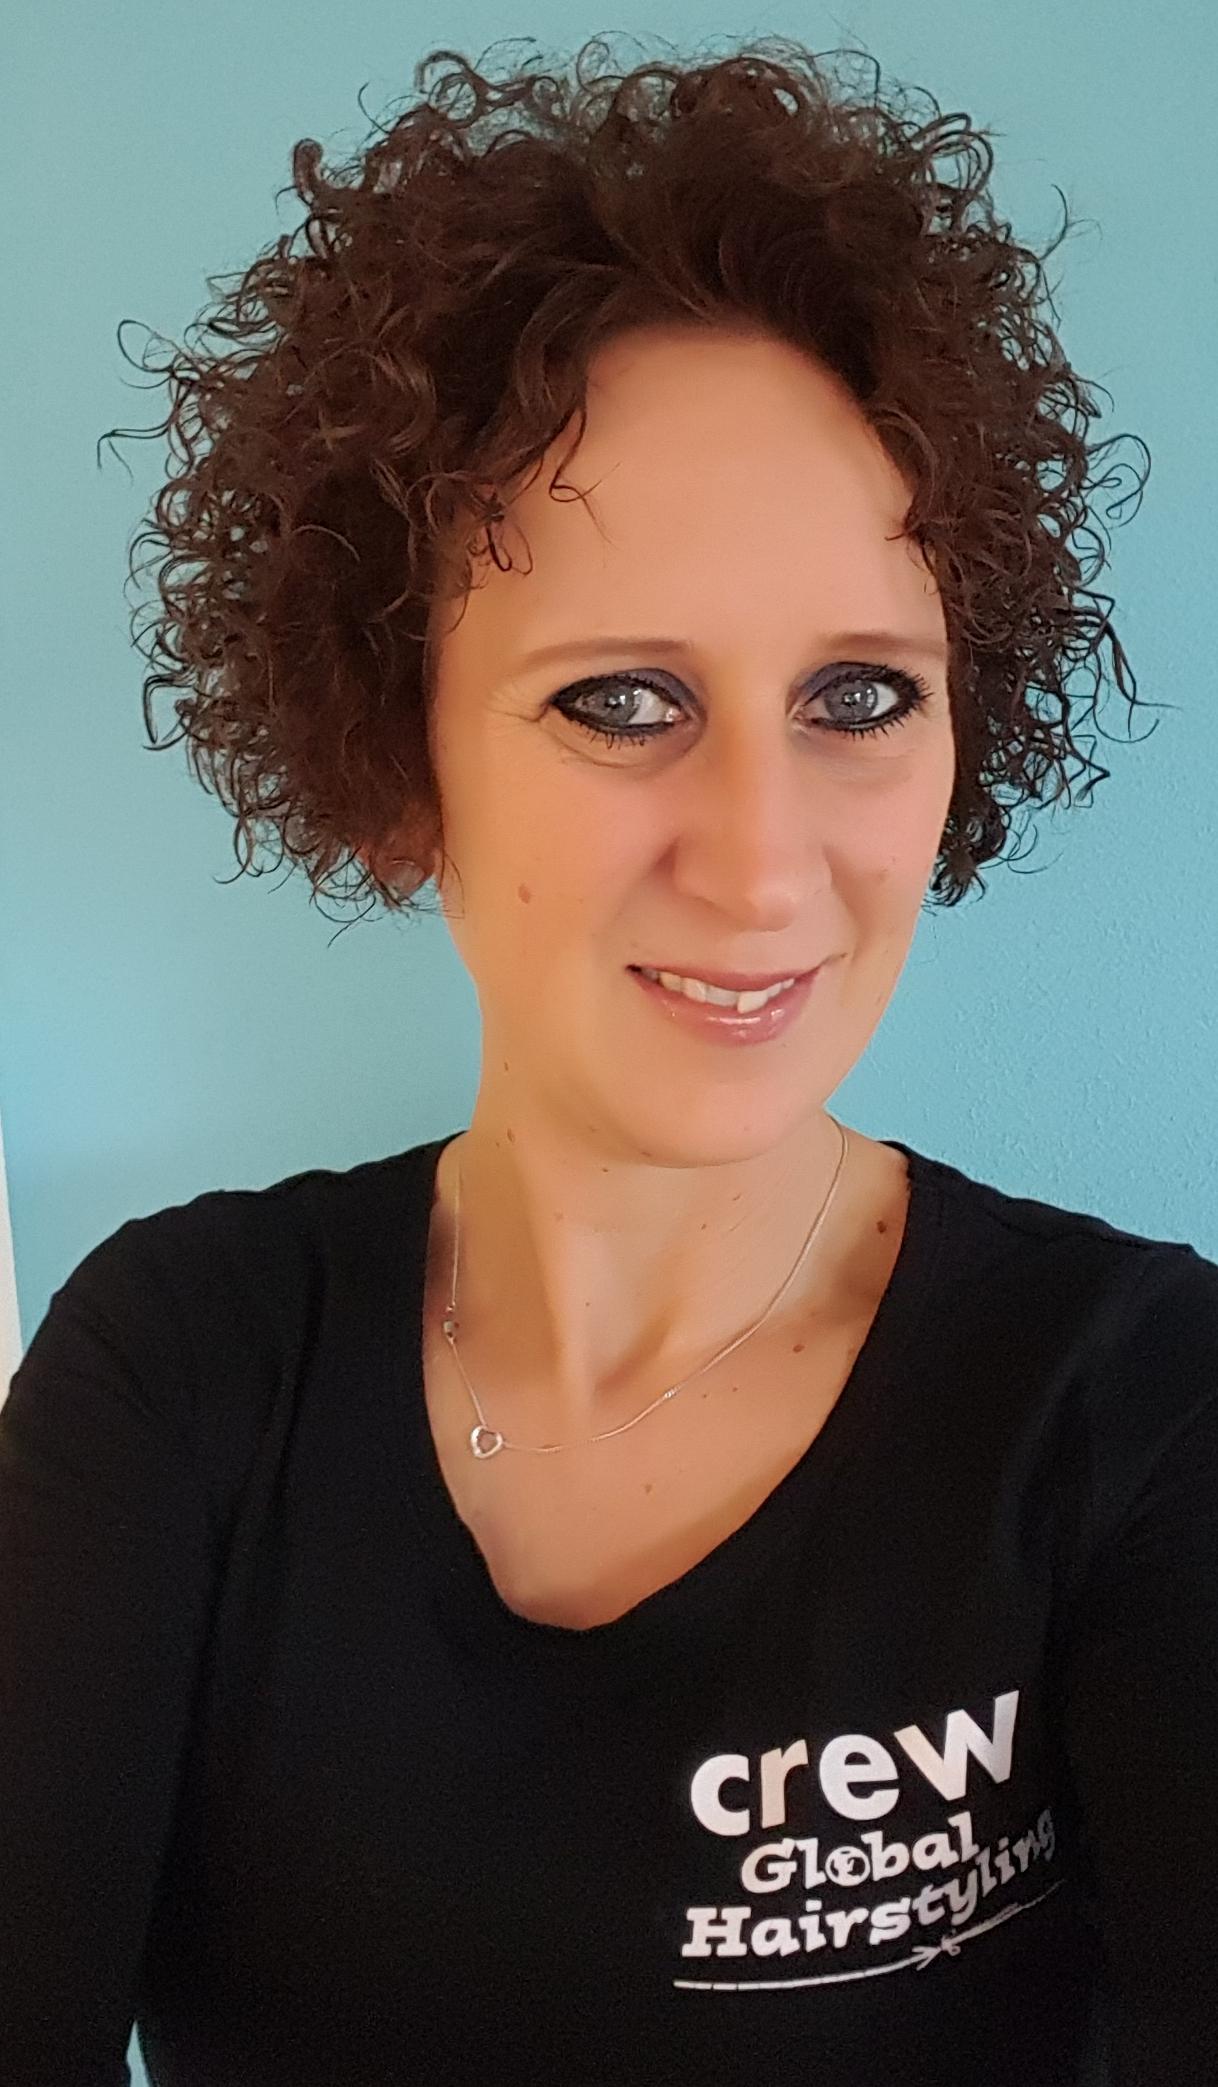 Marjan - Kapper bij Global Hairstyling Almere